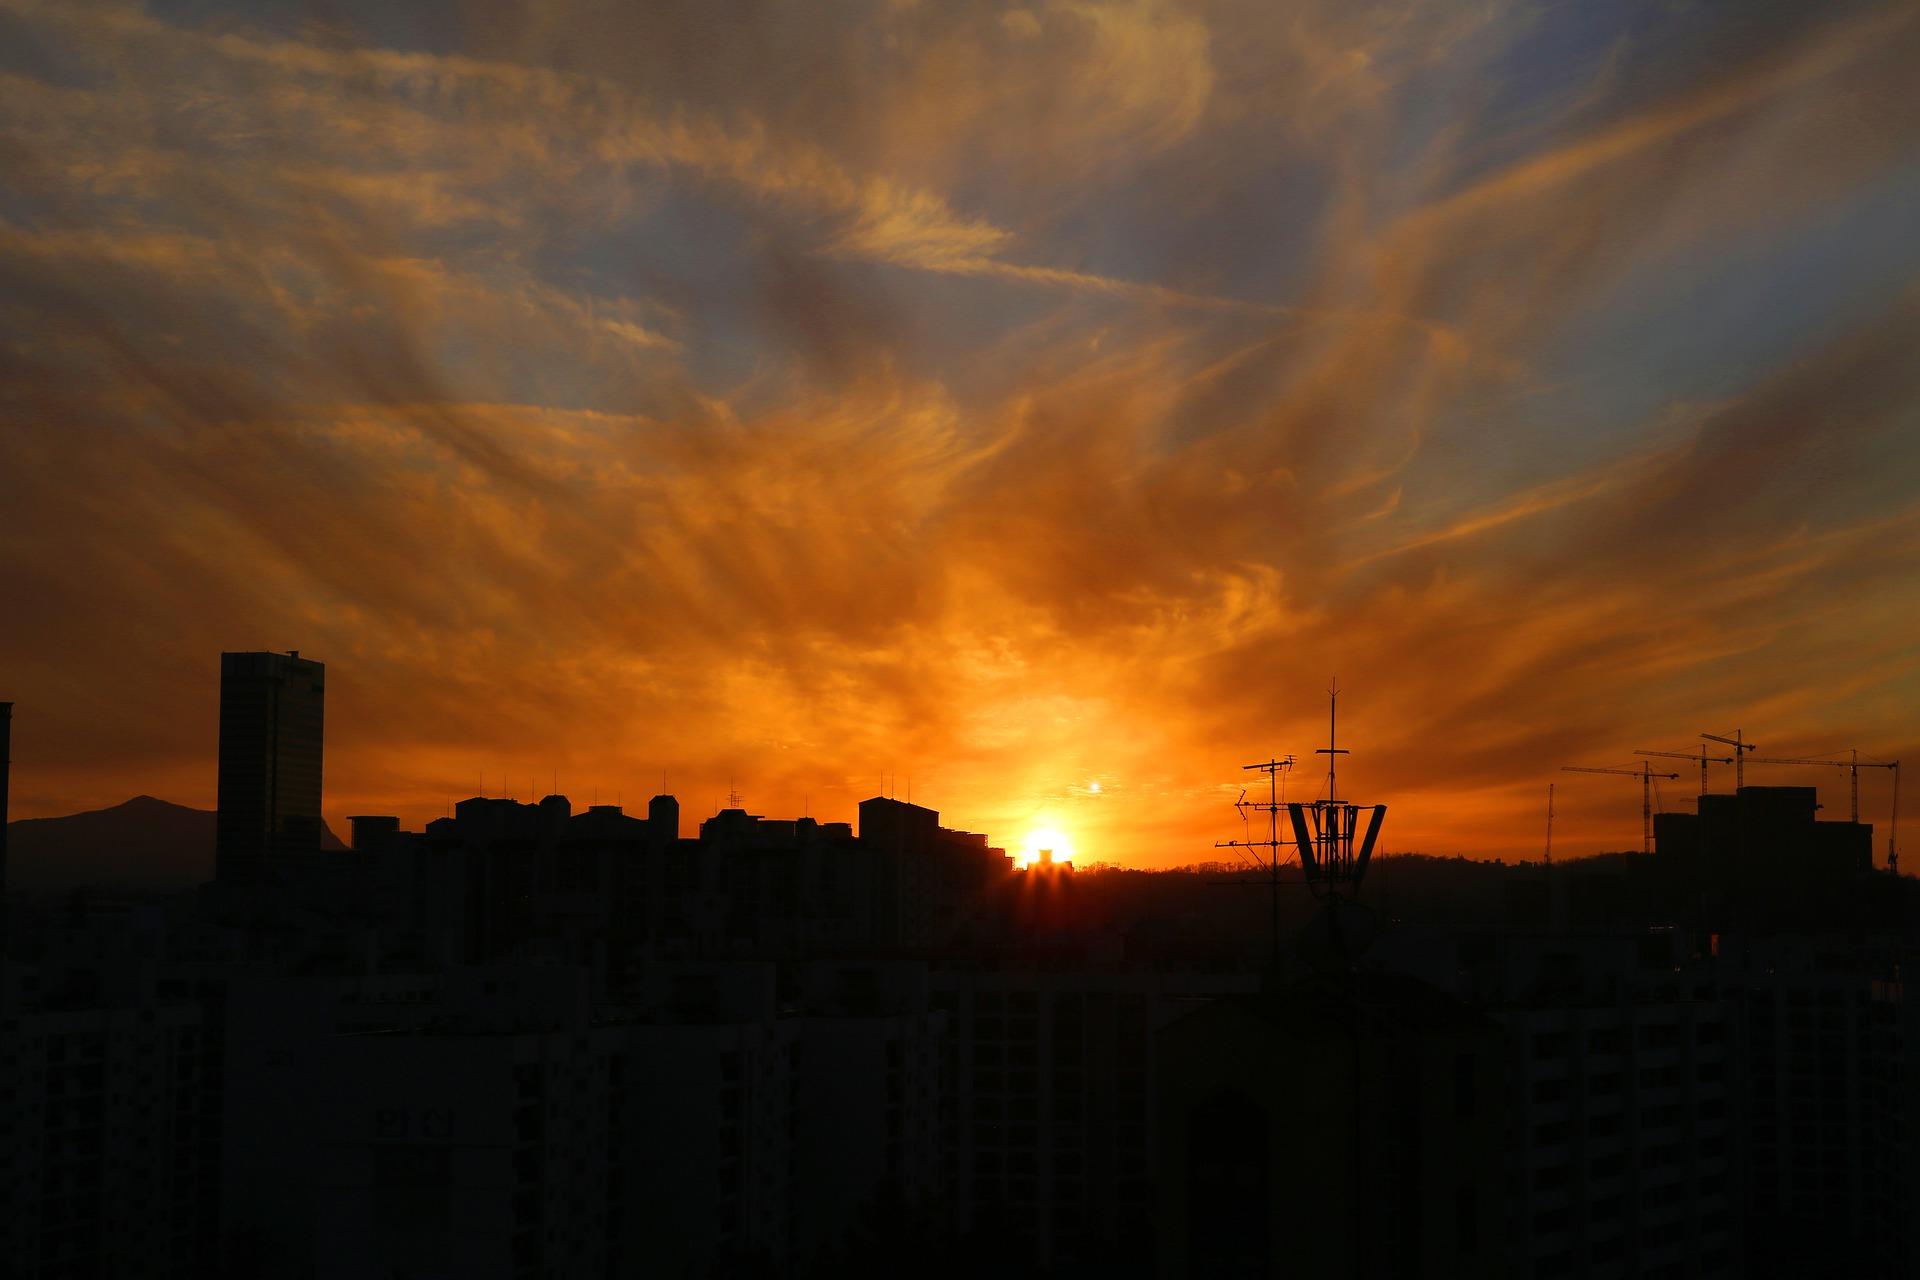 sunset-5024499_1920.jpg